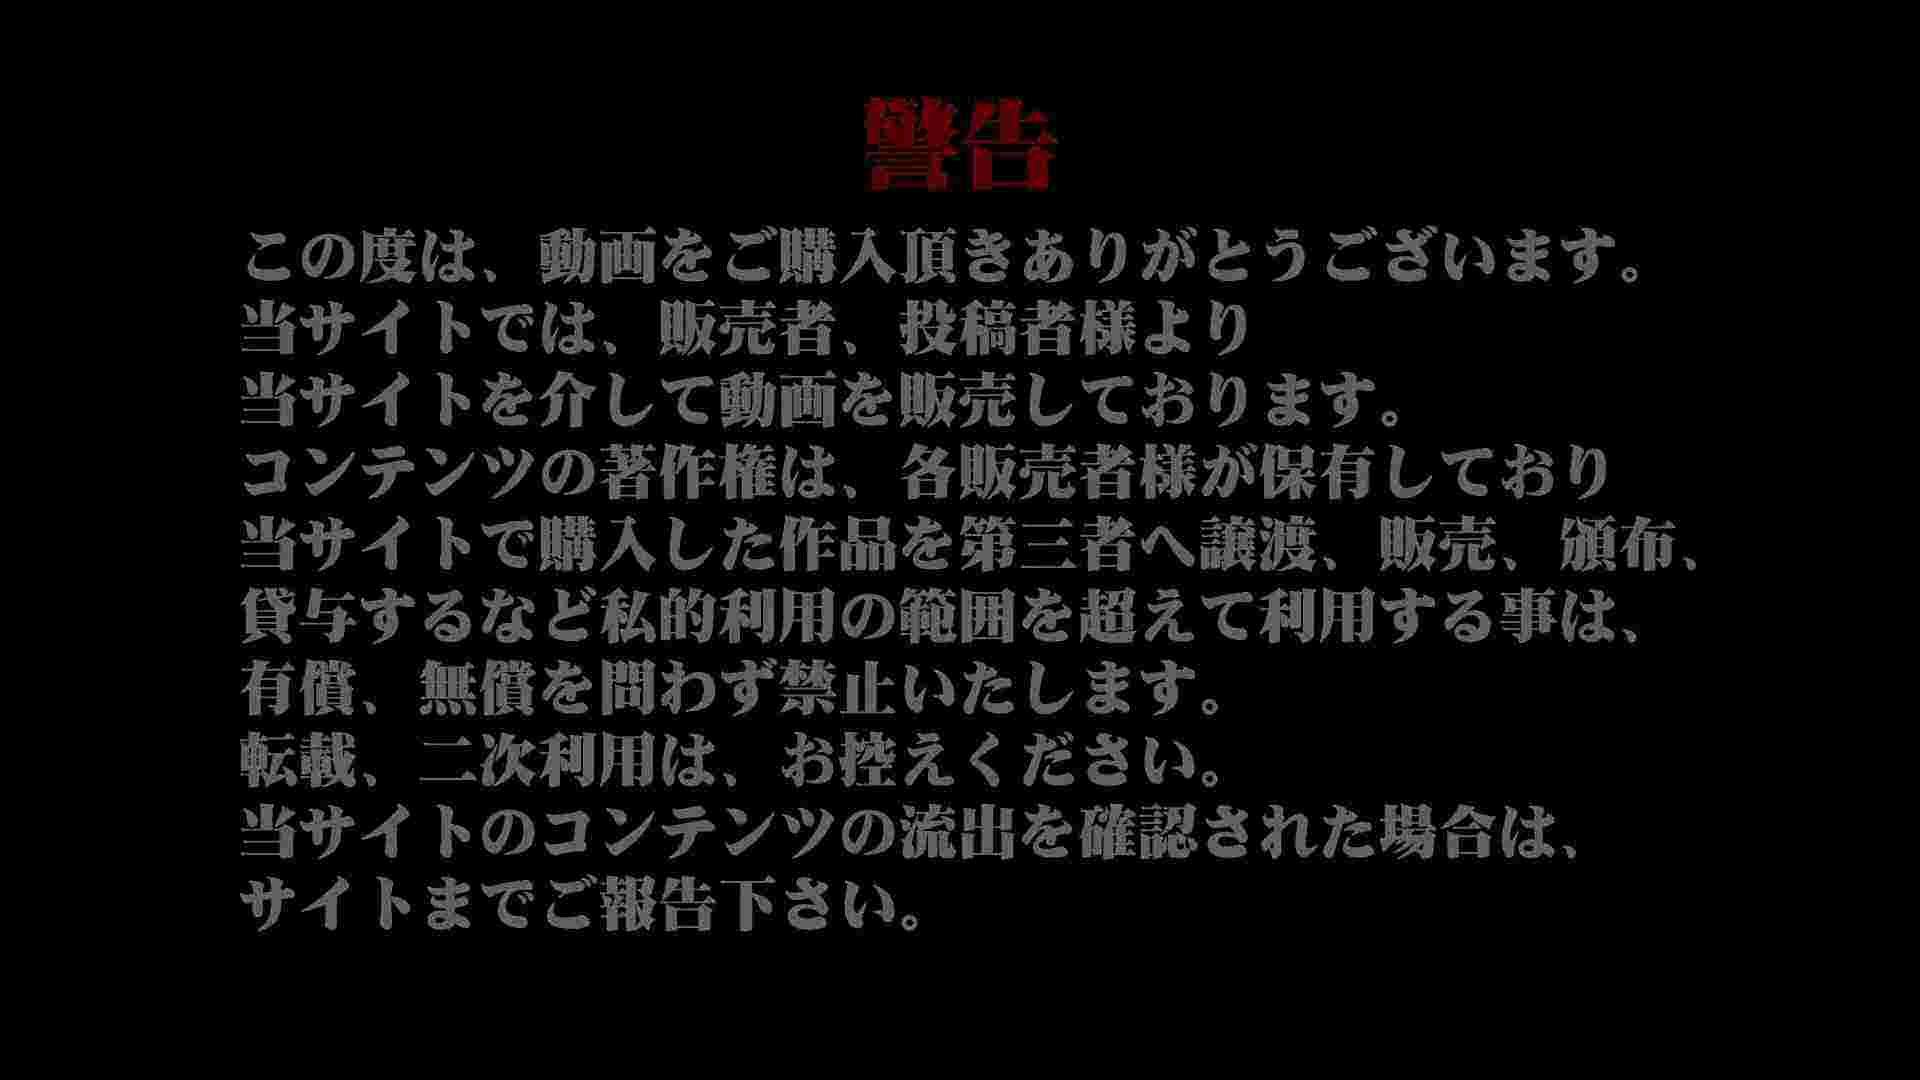 民家風呂専門盗撮師の超危険映像 vol.003 美少女ヌード   盗撮  58pic 22